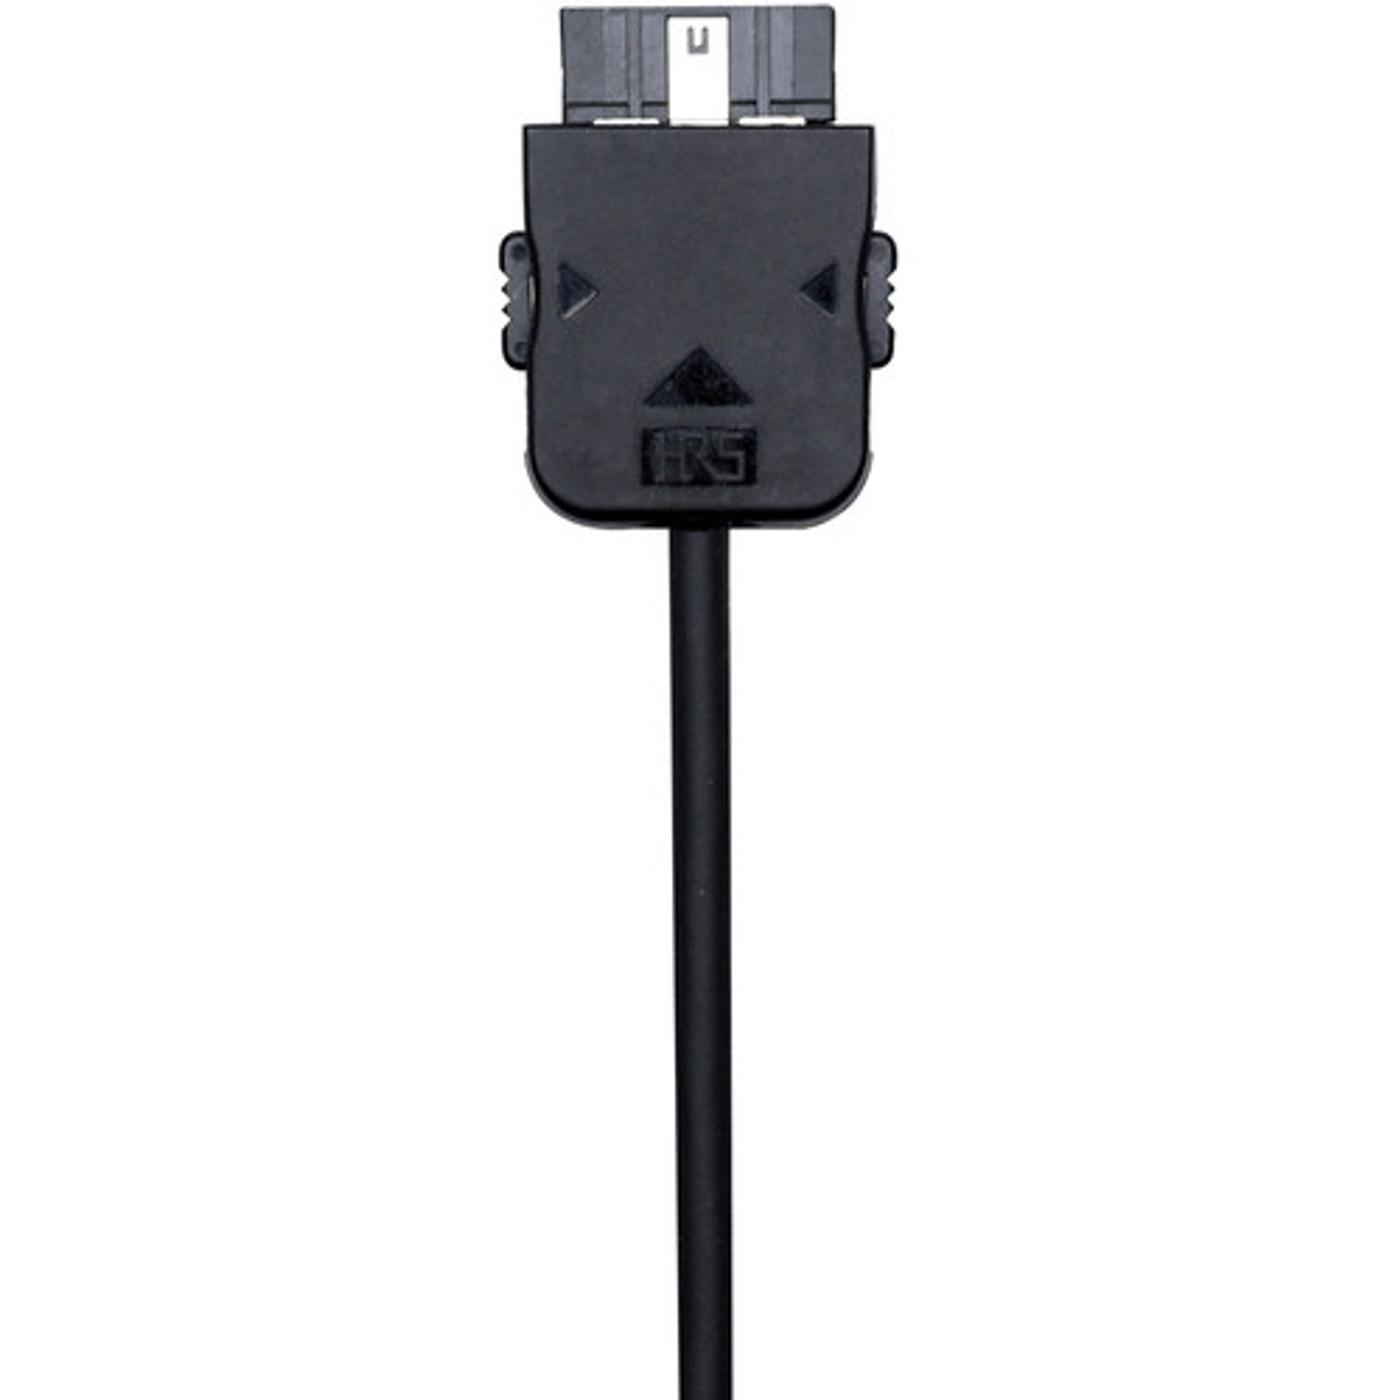 Focus Handwheel Inspire 2 Remote CAN Bus Cable